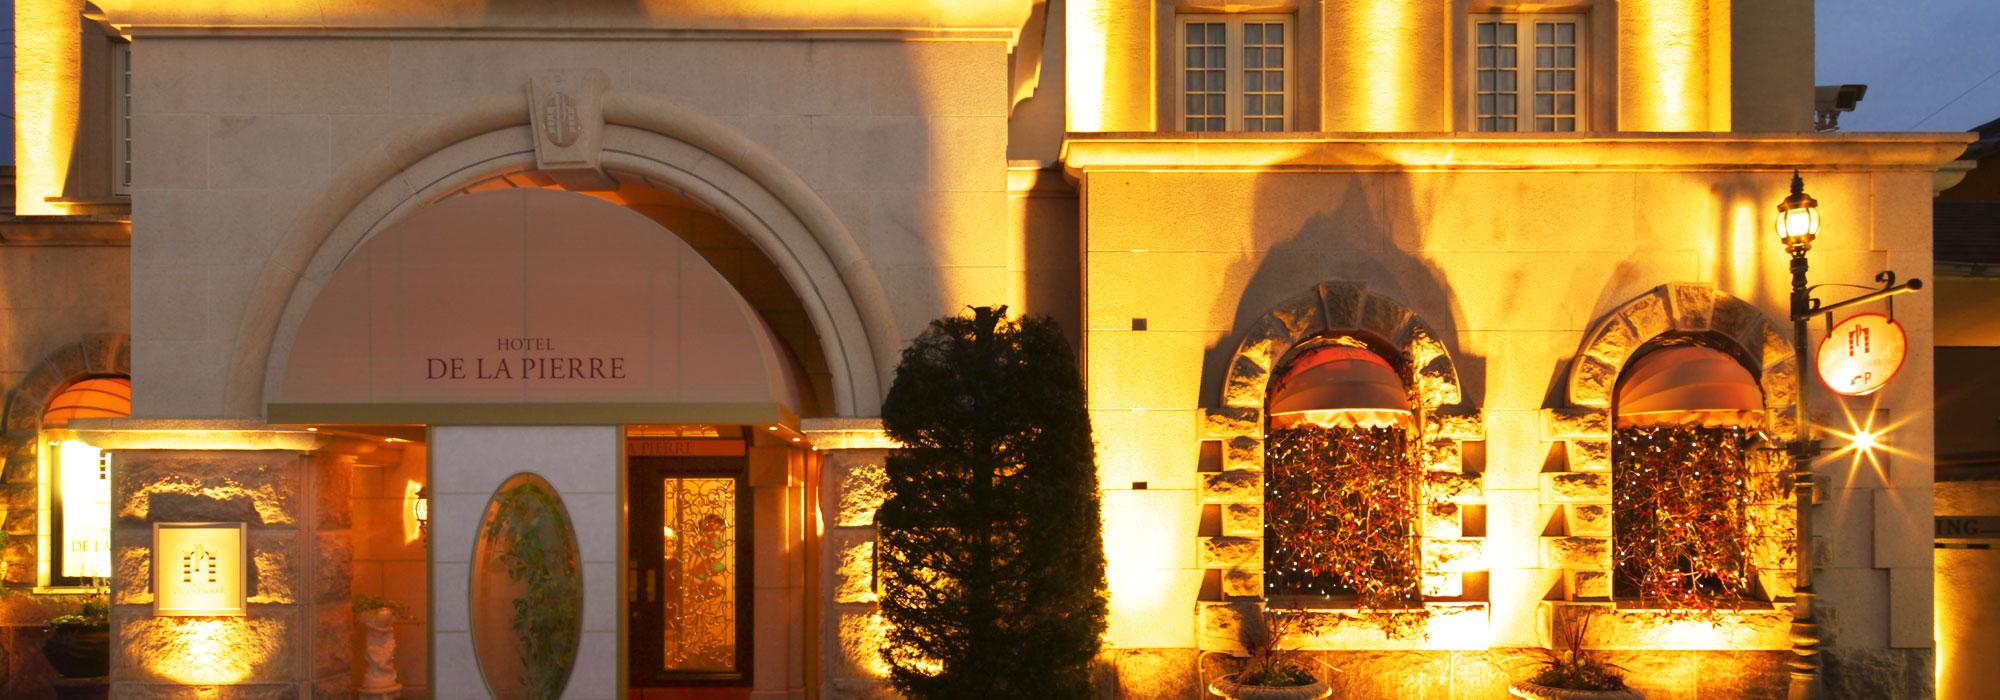 HOTEL DE LA PIERRE|サイトマップ